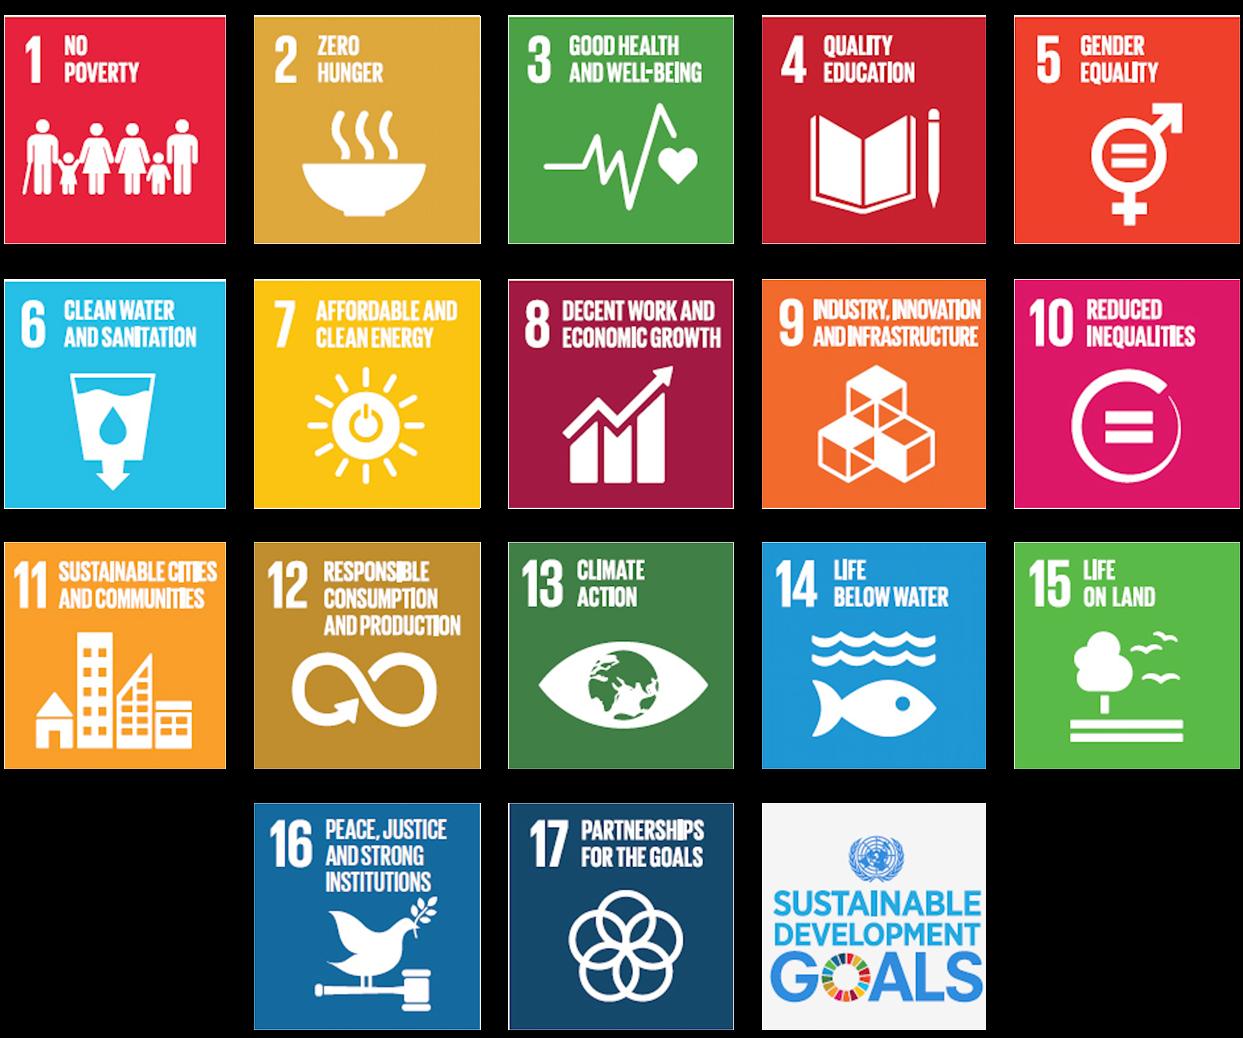 The UN sustainable goals one through seventeen.